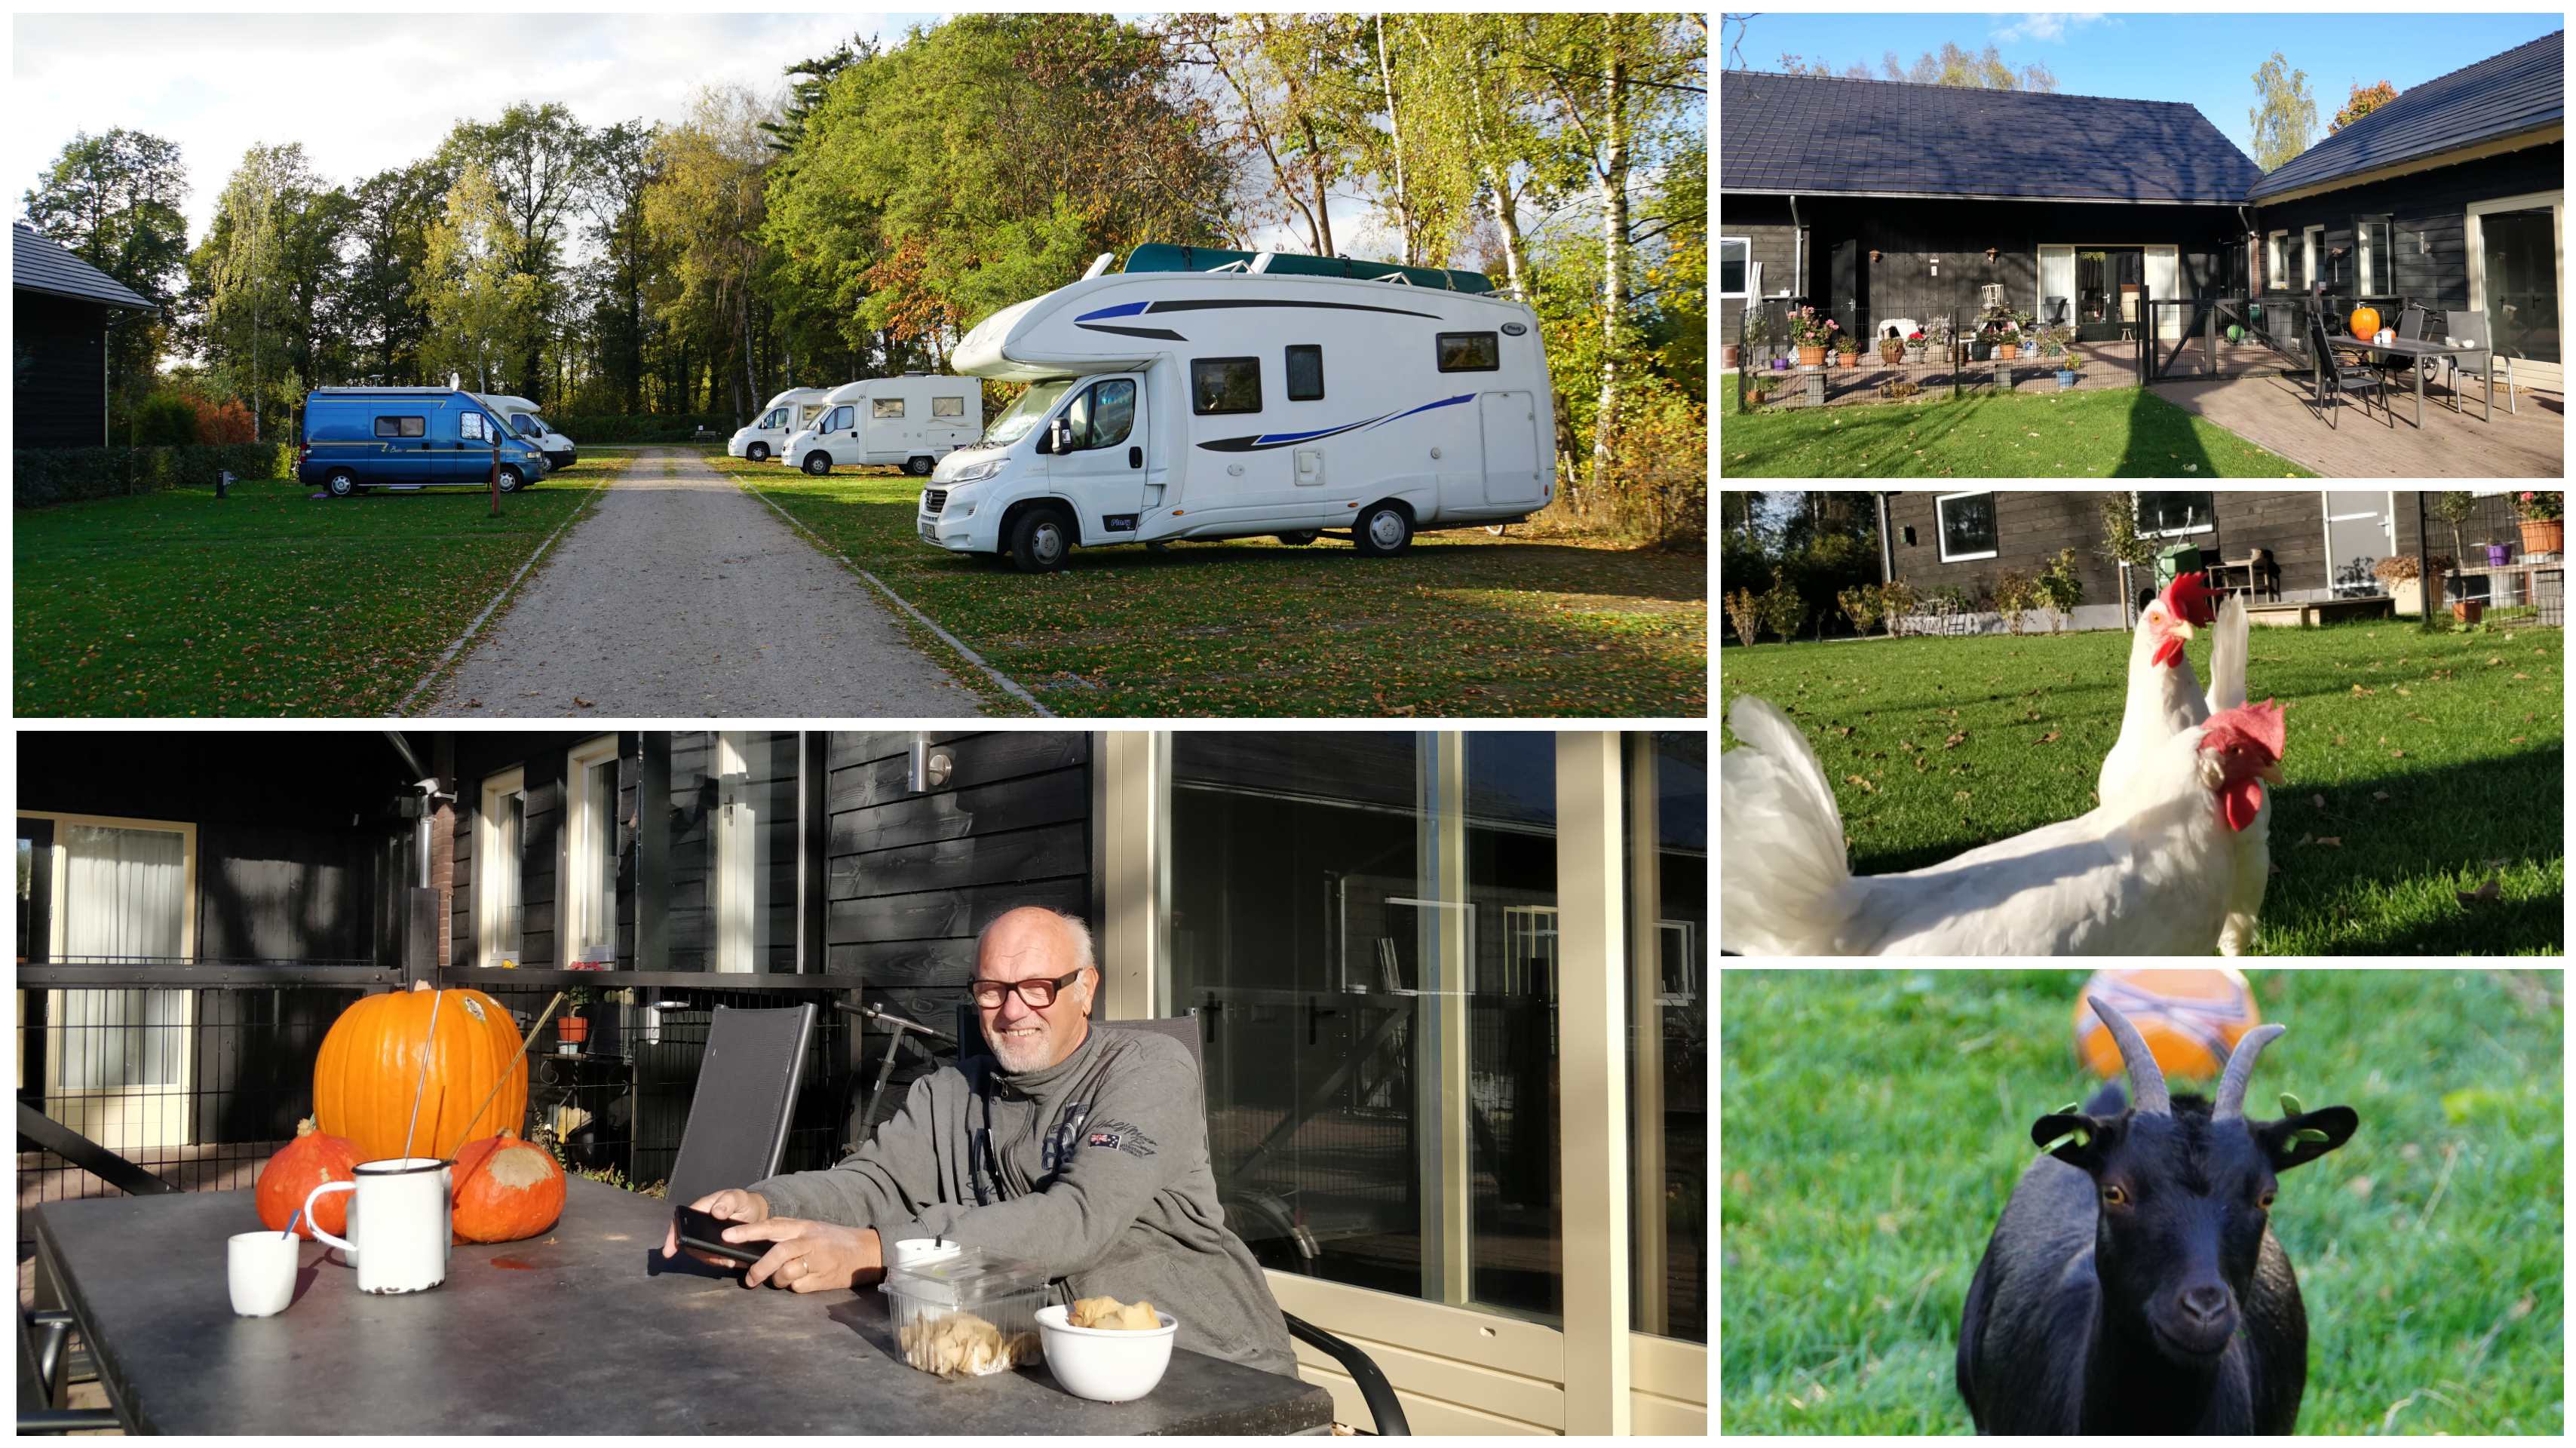 CamperCamping de Ravenhorst